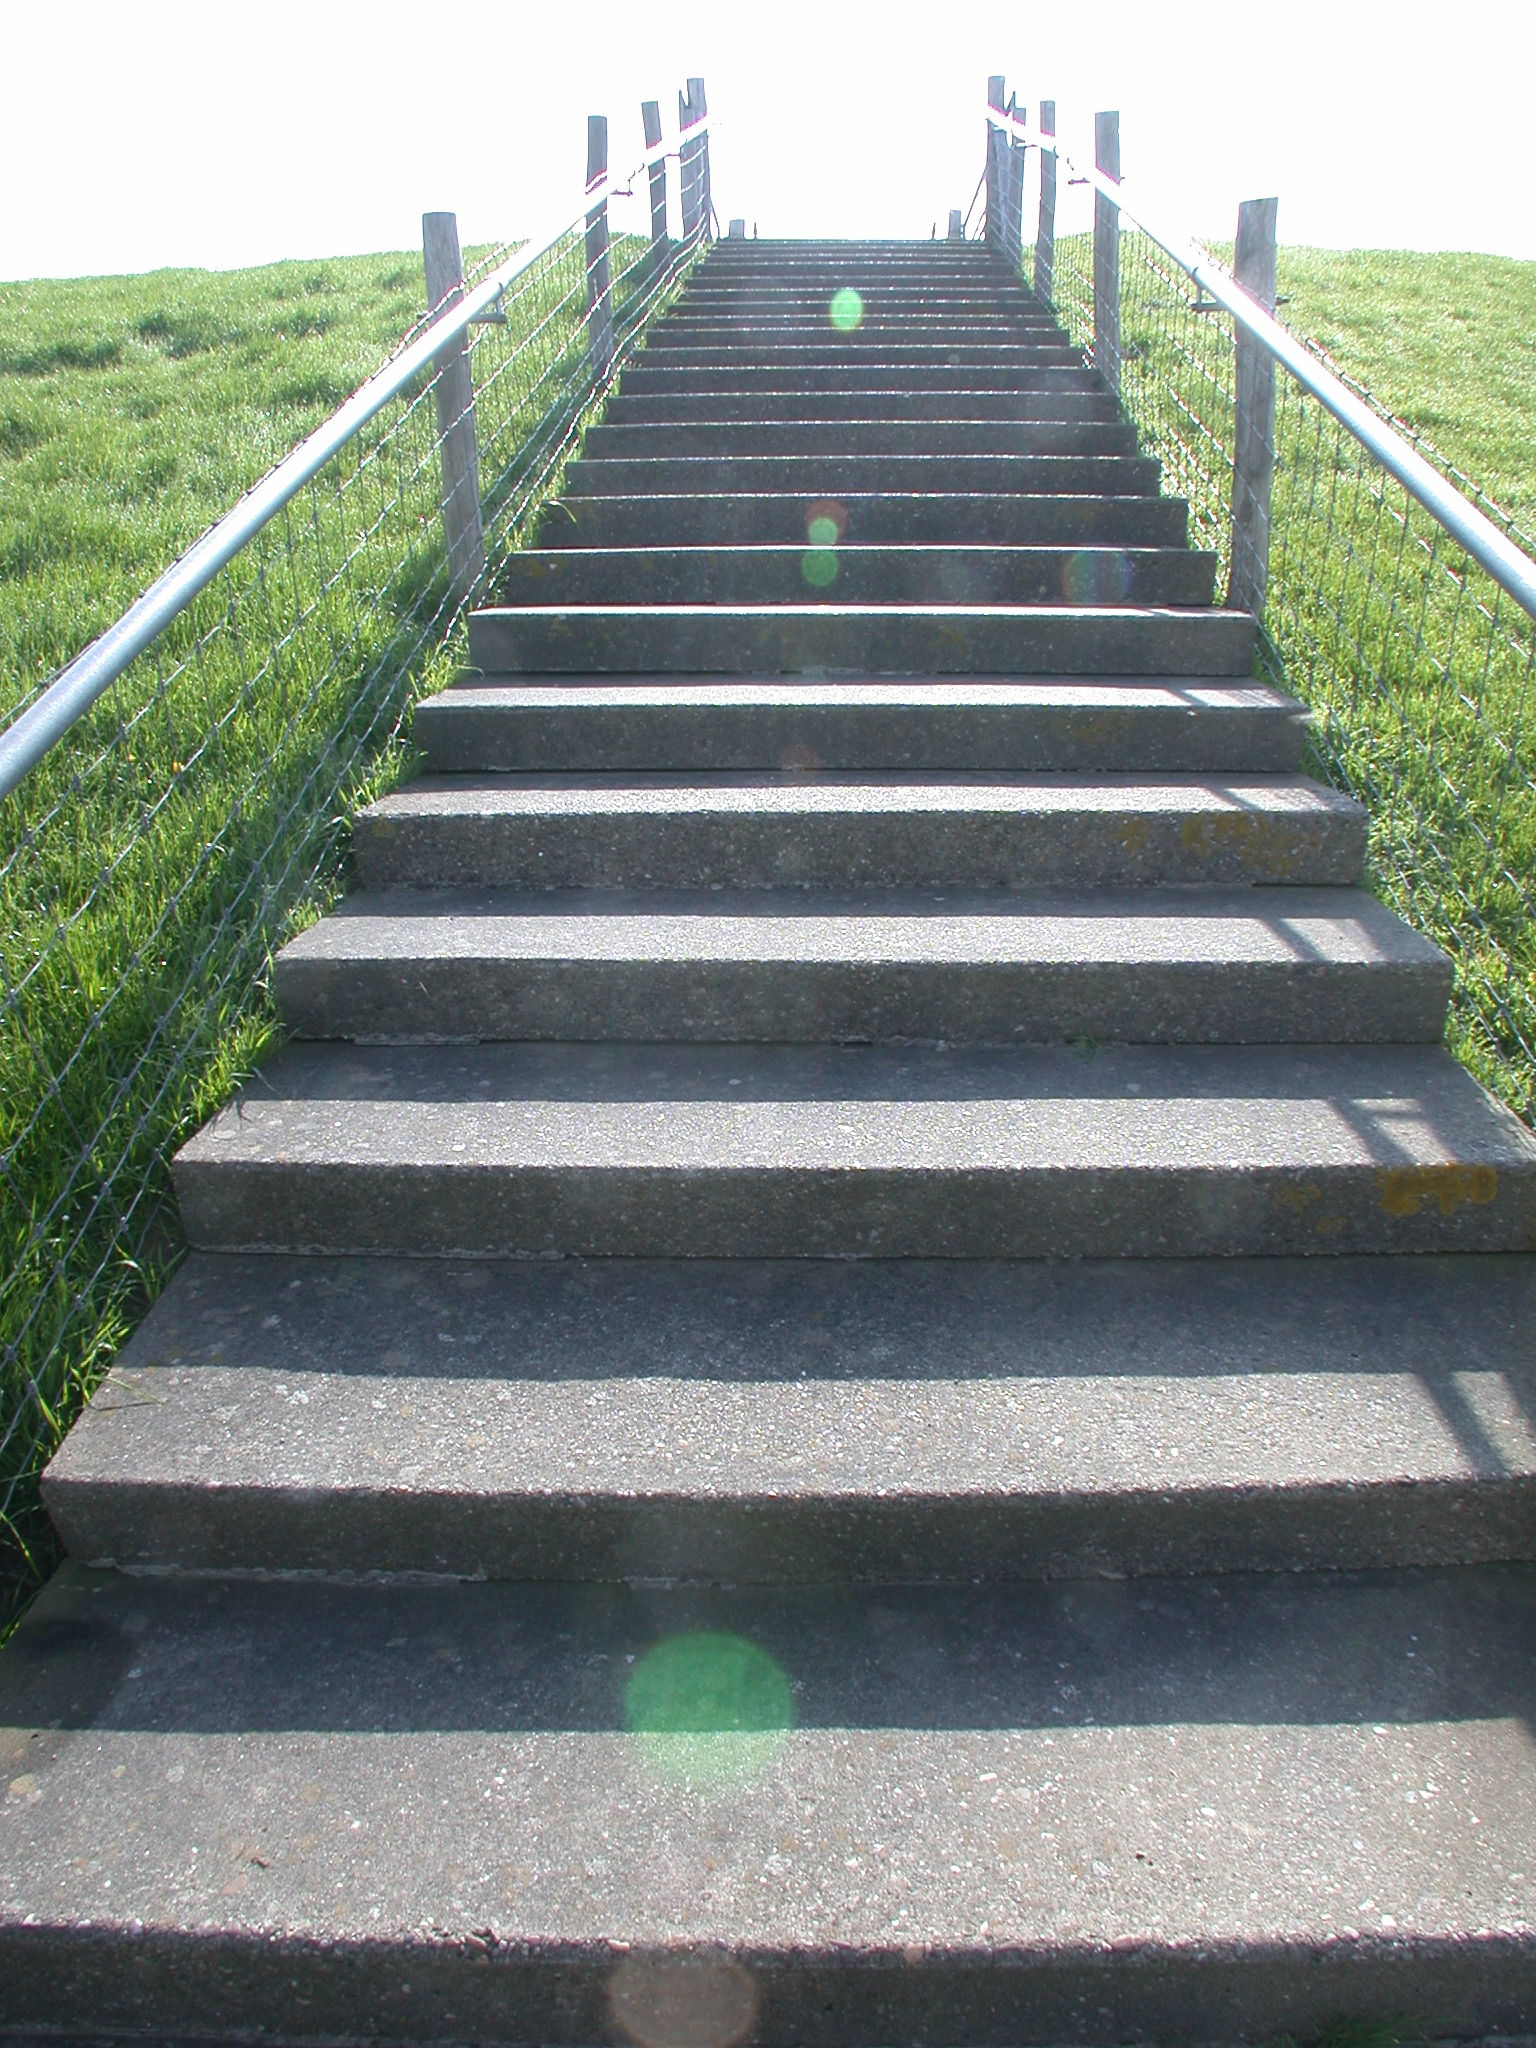 dike stairs steps railing grass